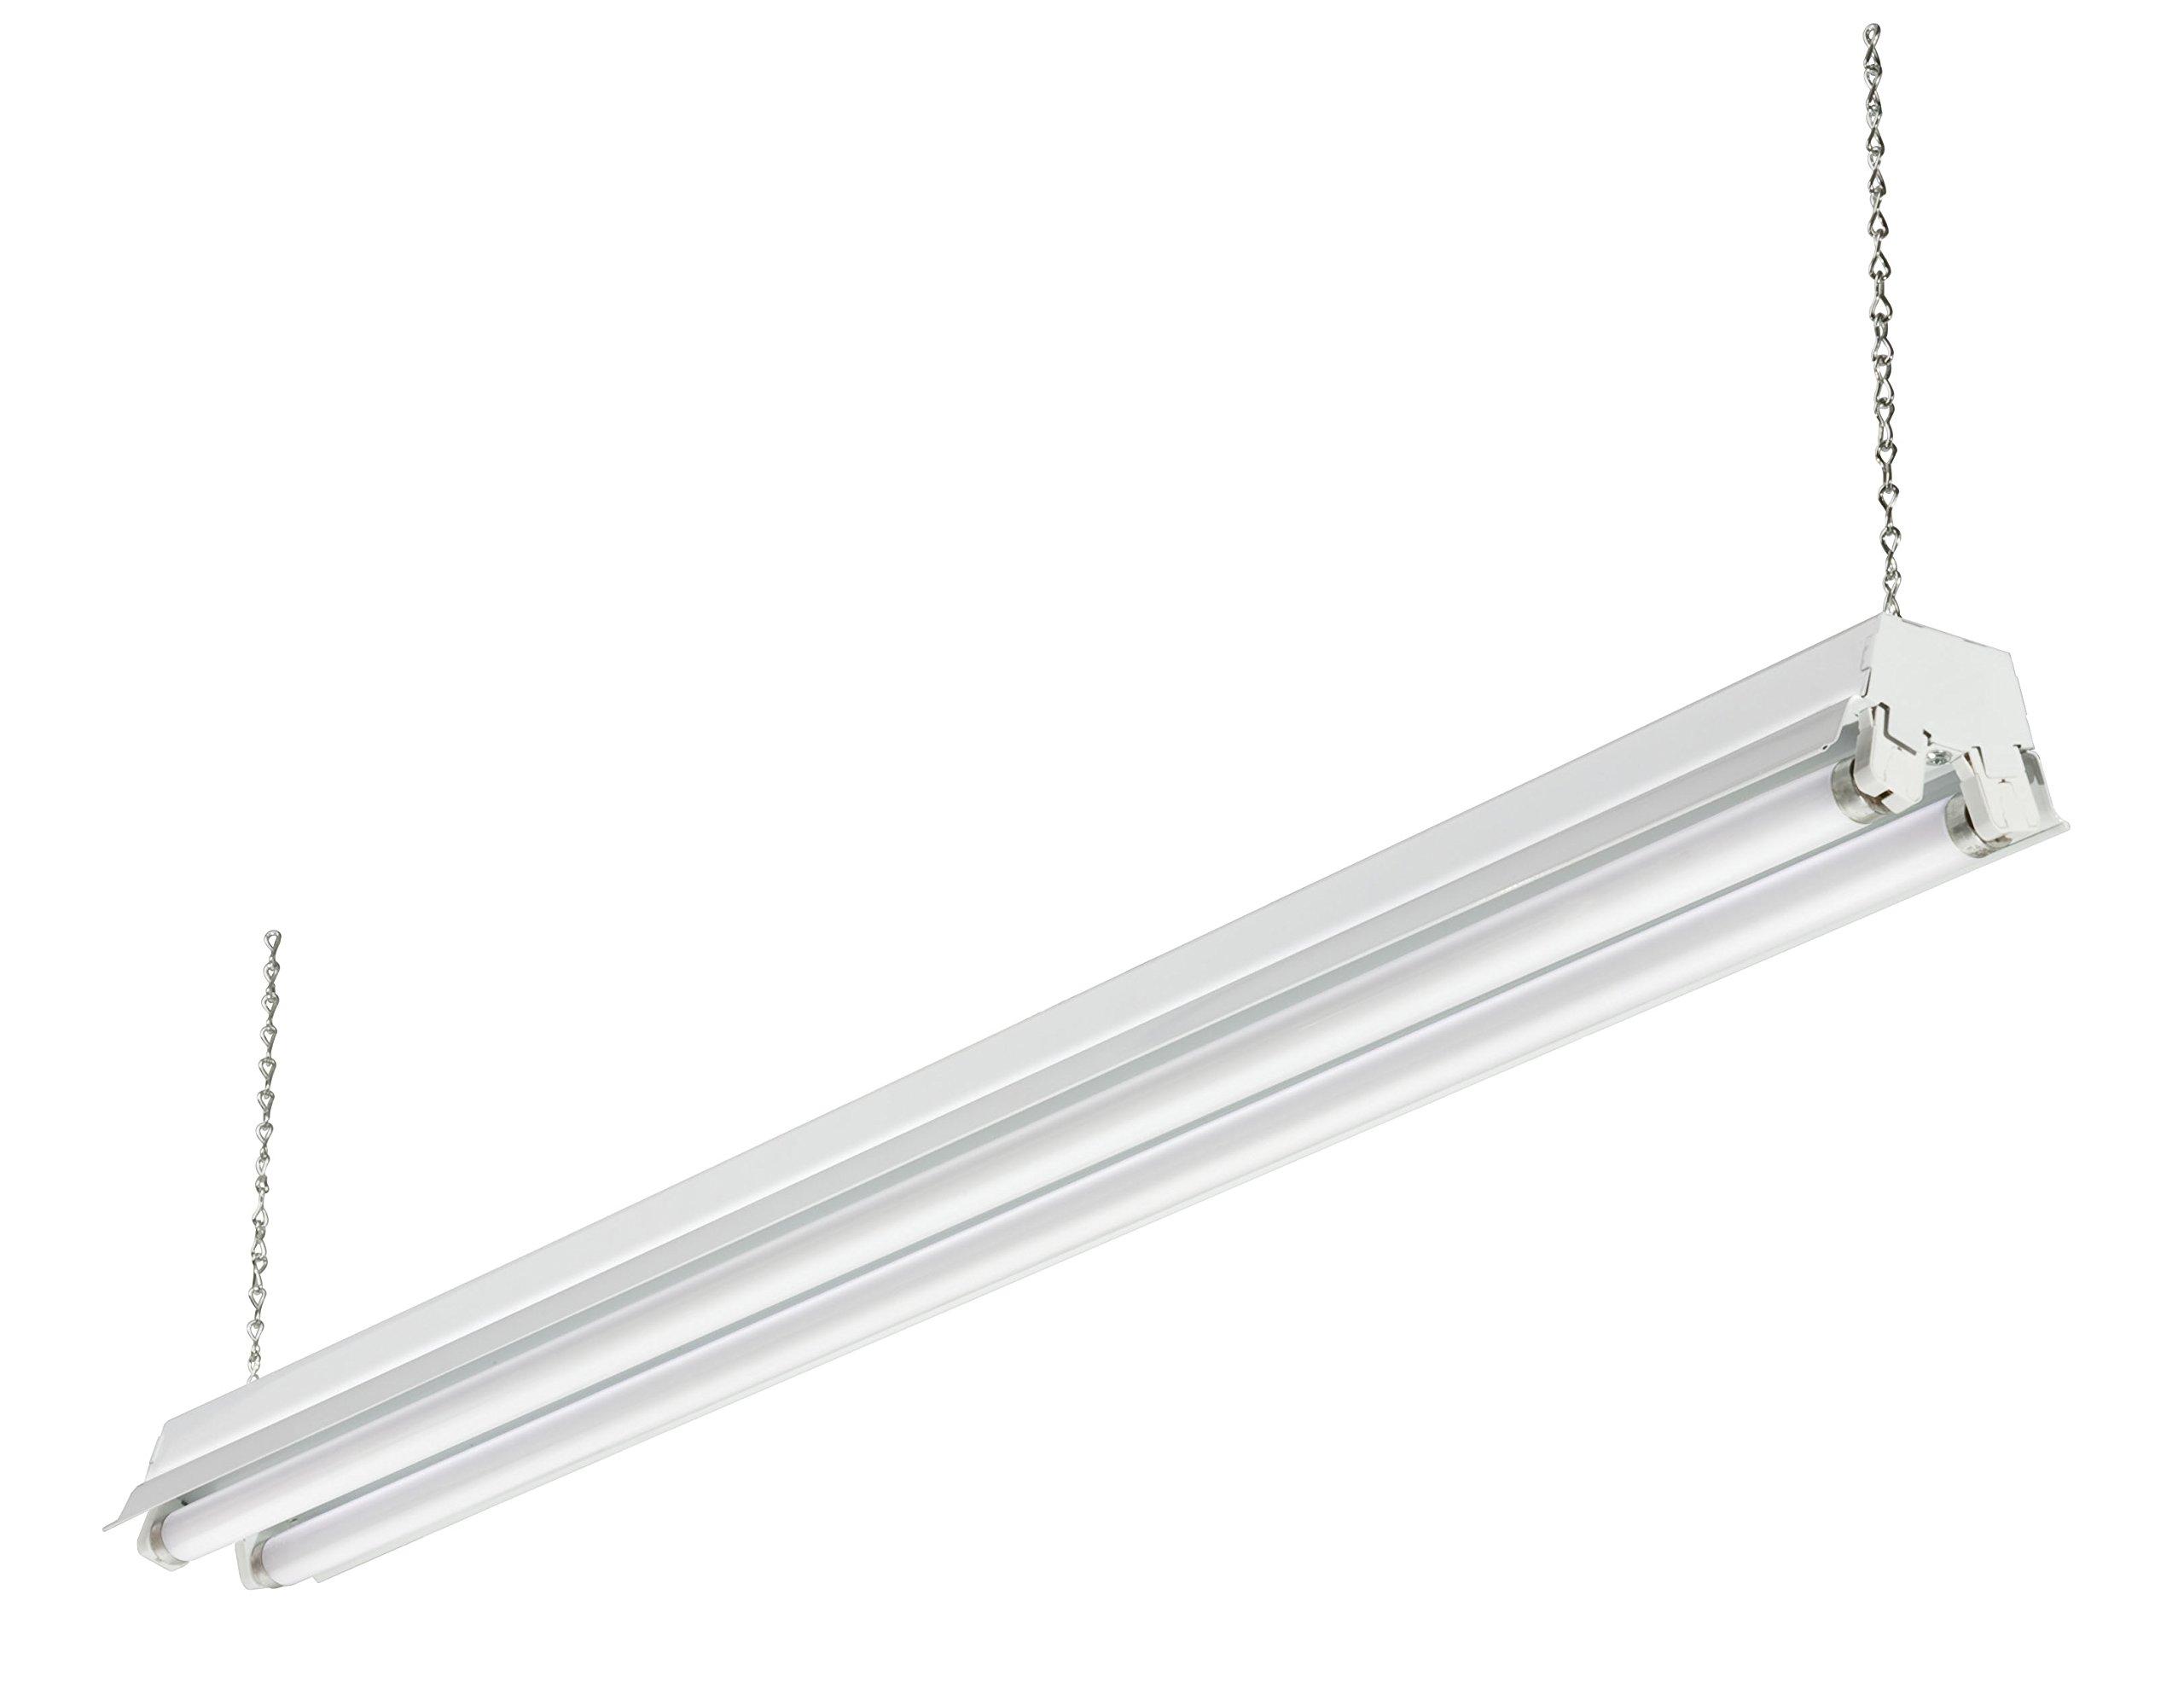 Lithonia Lighting 1233 CW 232 SHOPLIGHT 4-Feet 2-Light T8 32W Fluorescent Cold Weather Shop Light, White